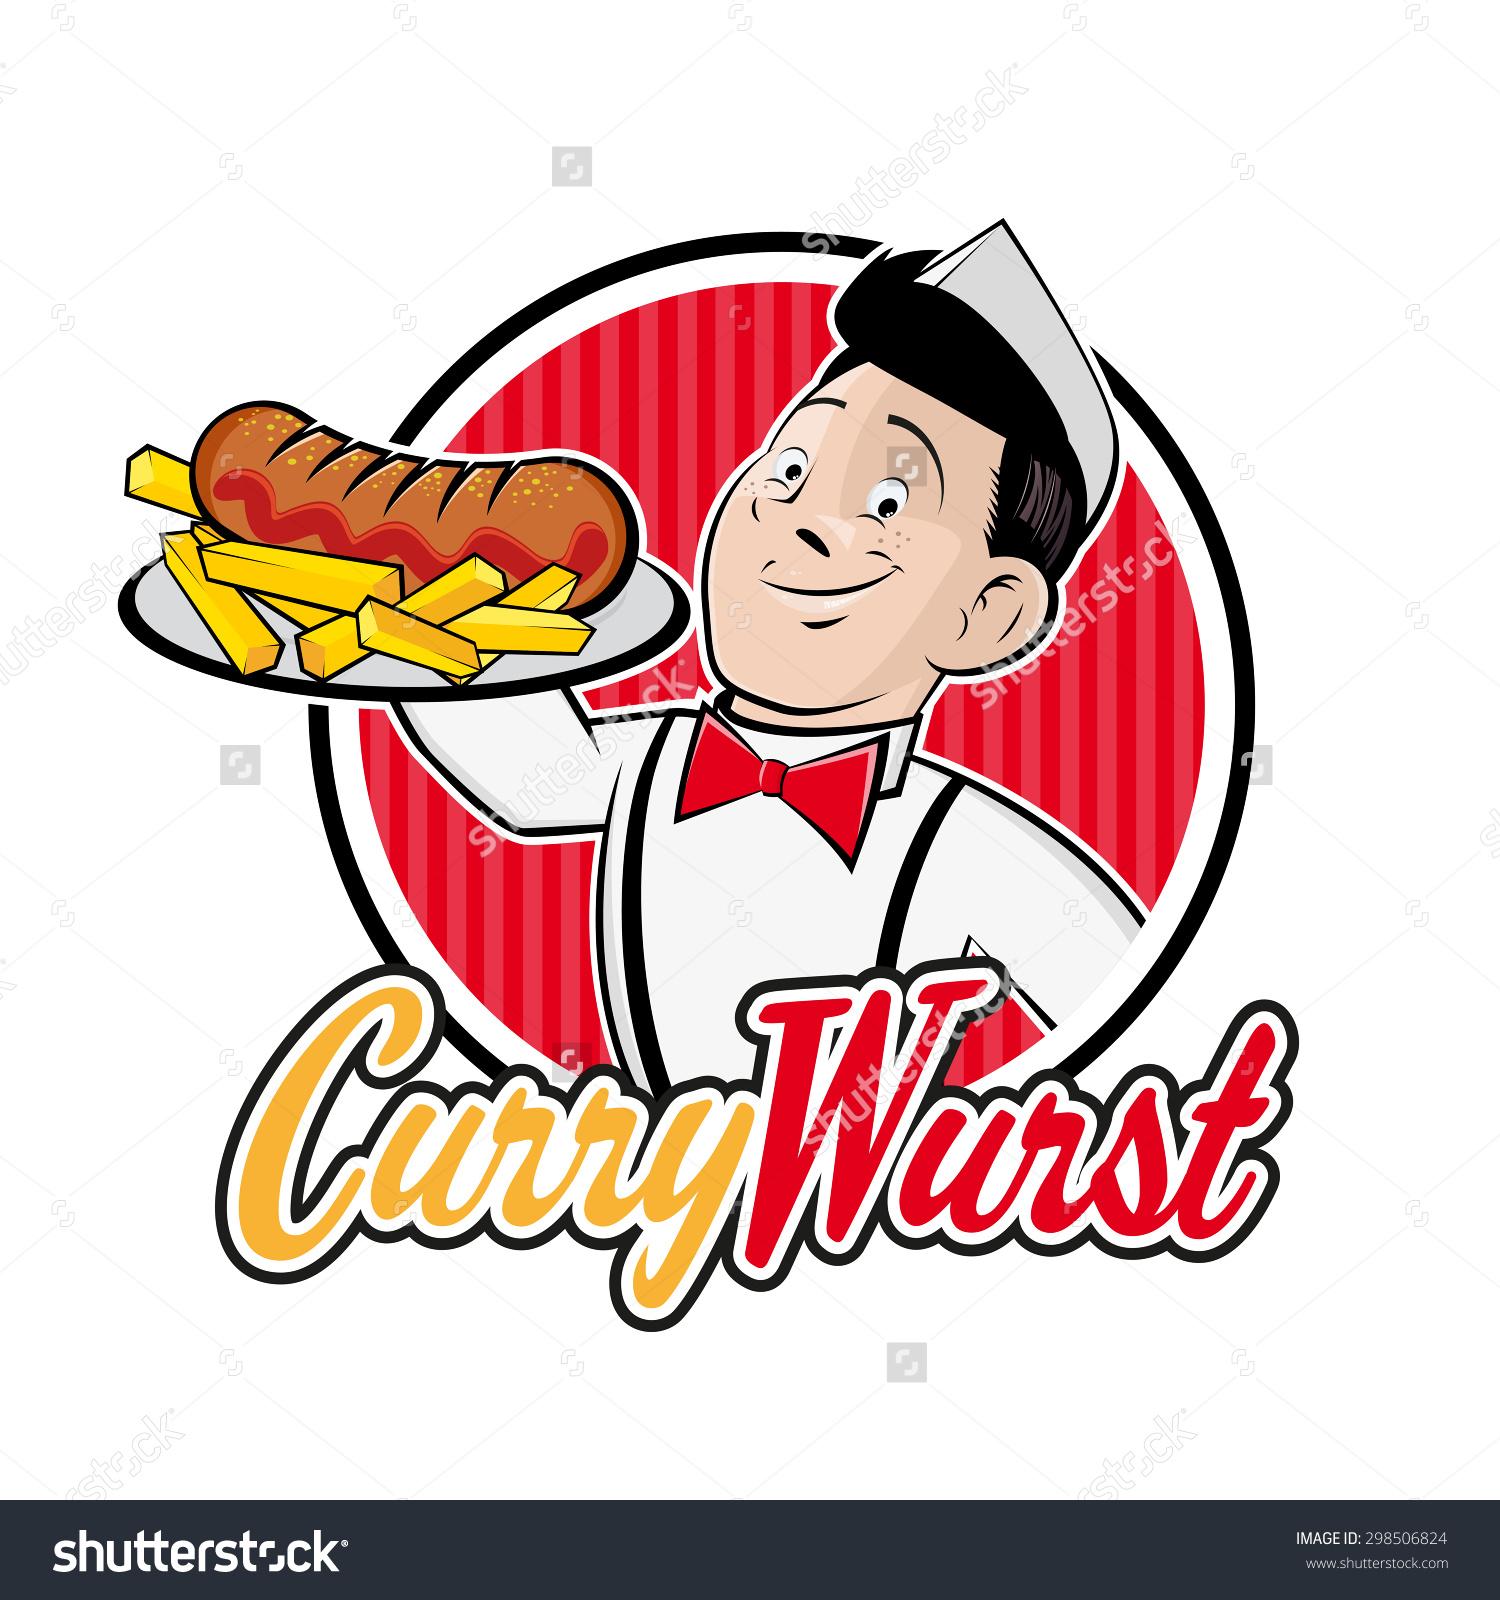 Retro Cartoon Man German Currywurst Badge Stock Vector 298506824.